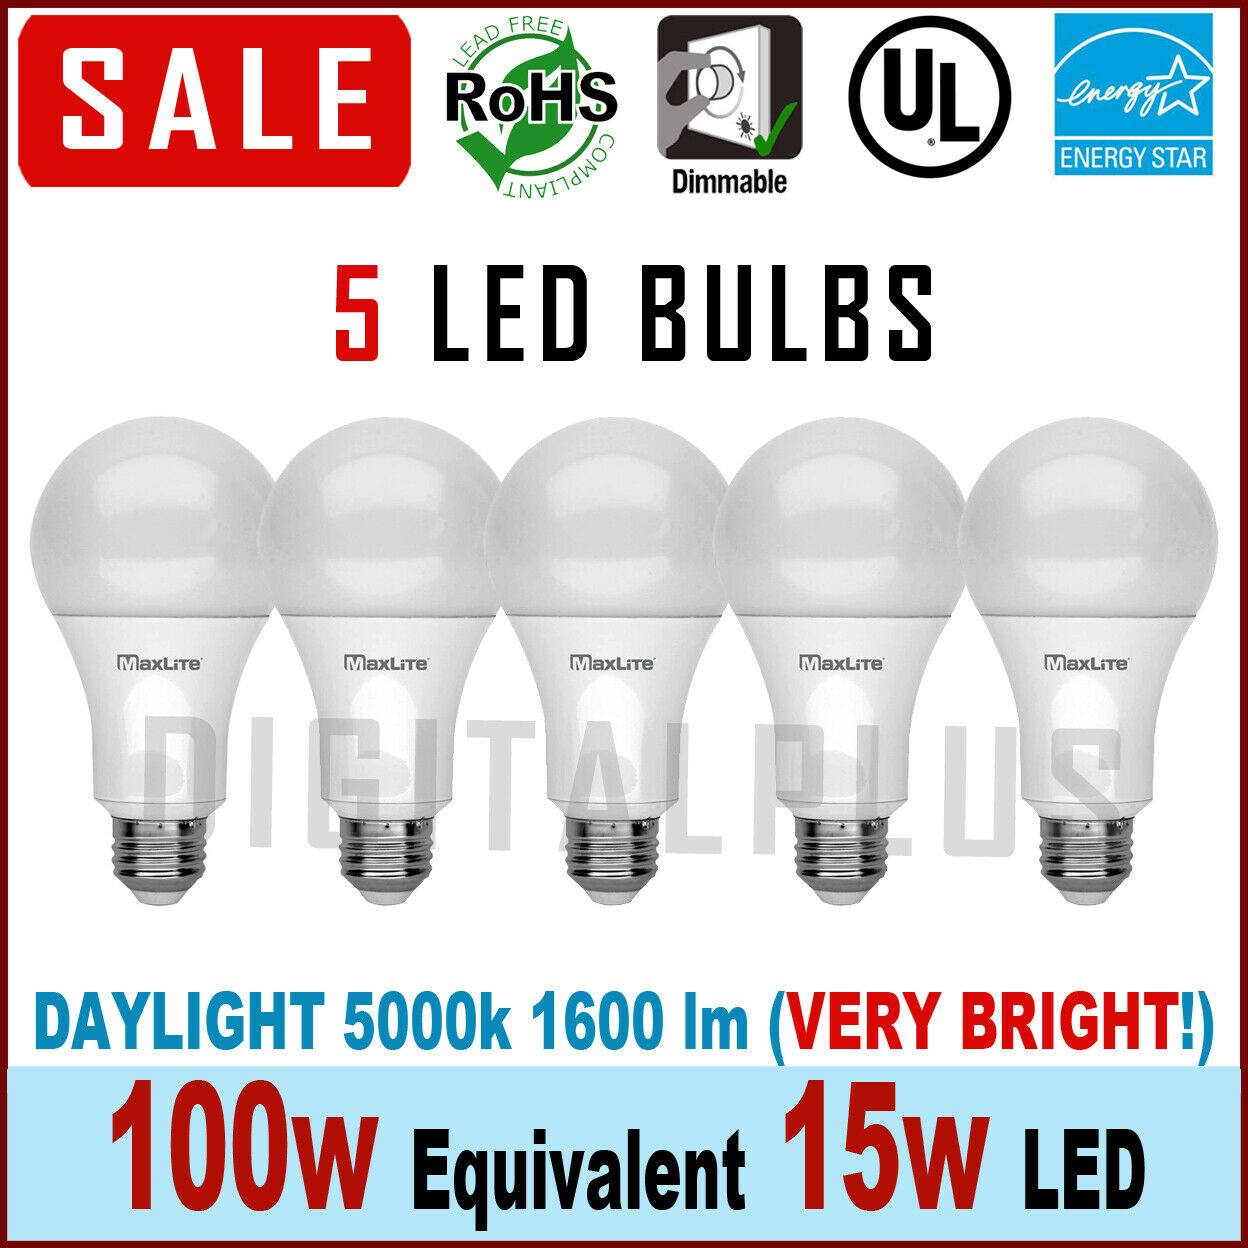 Maxlite LED Light Bulbs Daylight Dimmable 15Watt 100 Watt Eq